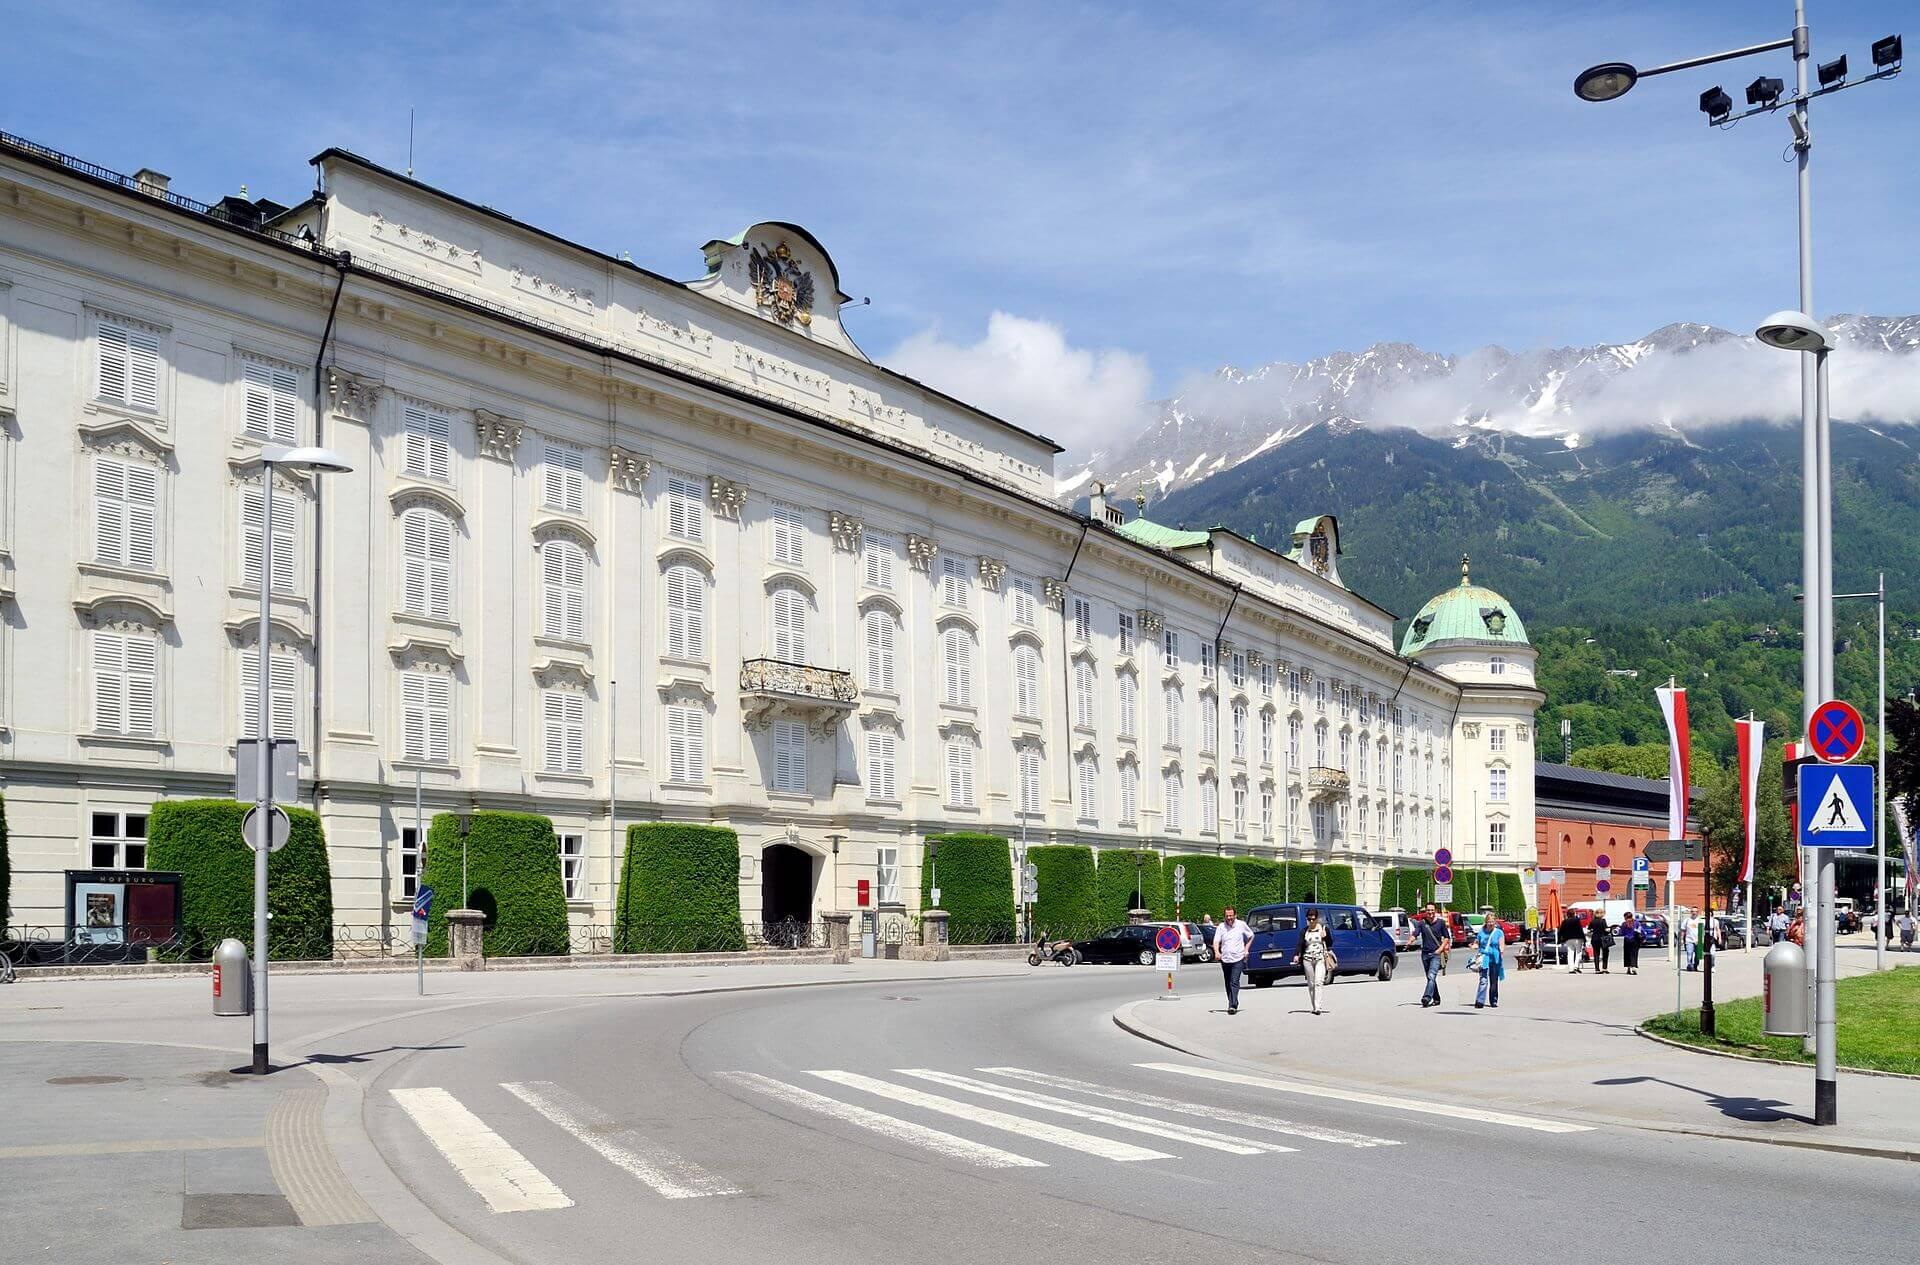 Императорский дворец «Хофбург»